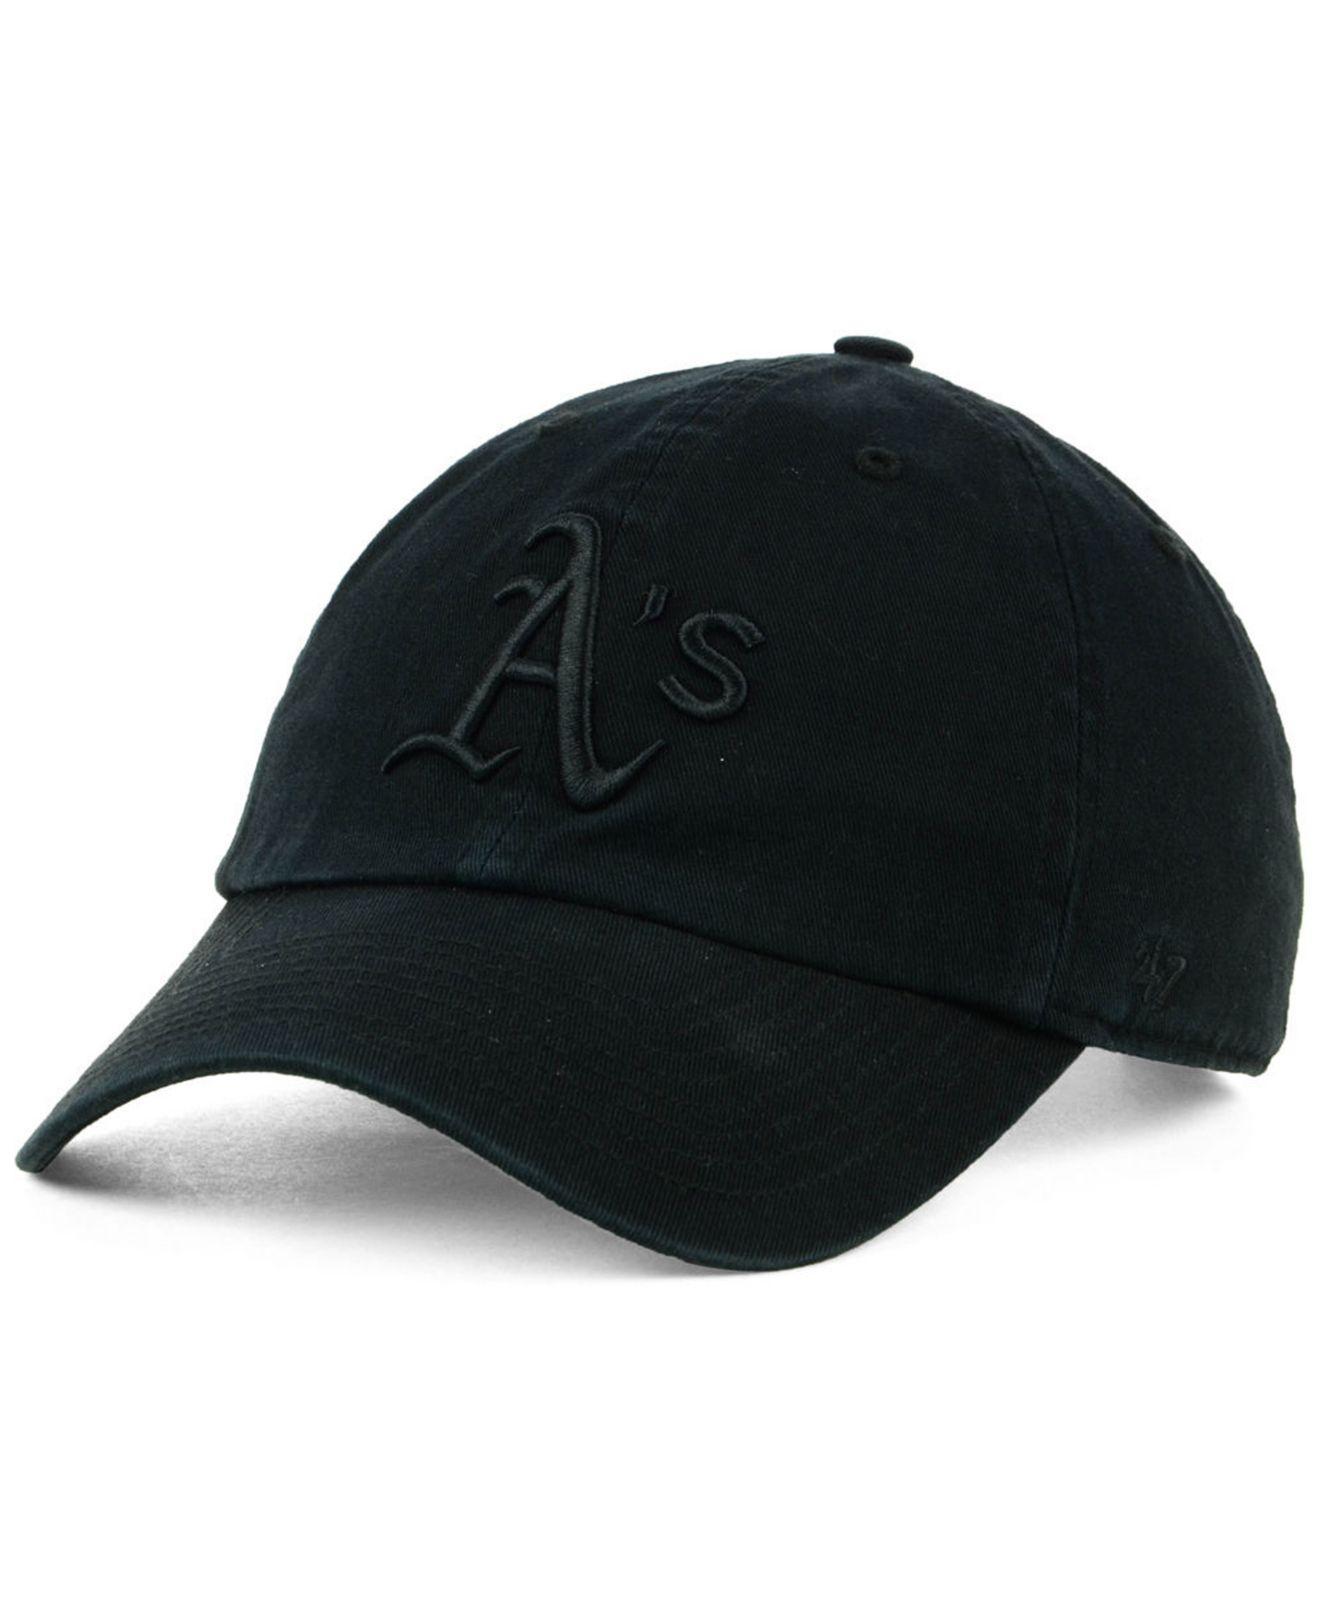 db0c0f5b61d Lyst - 47 Brand Oakland Athletics Black On Black Clean Up Cap in ...